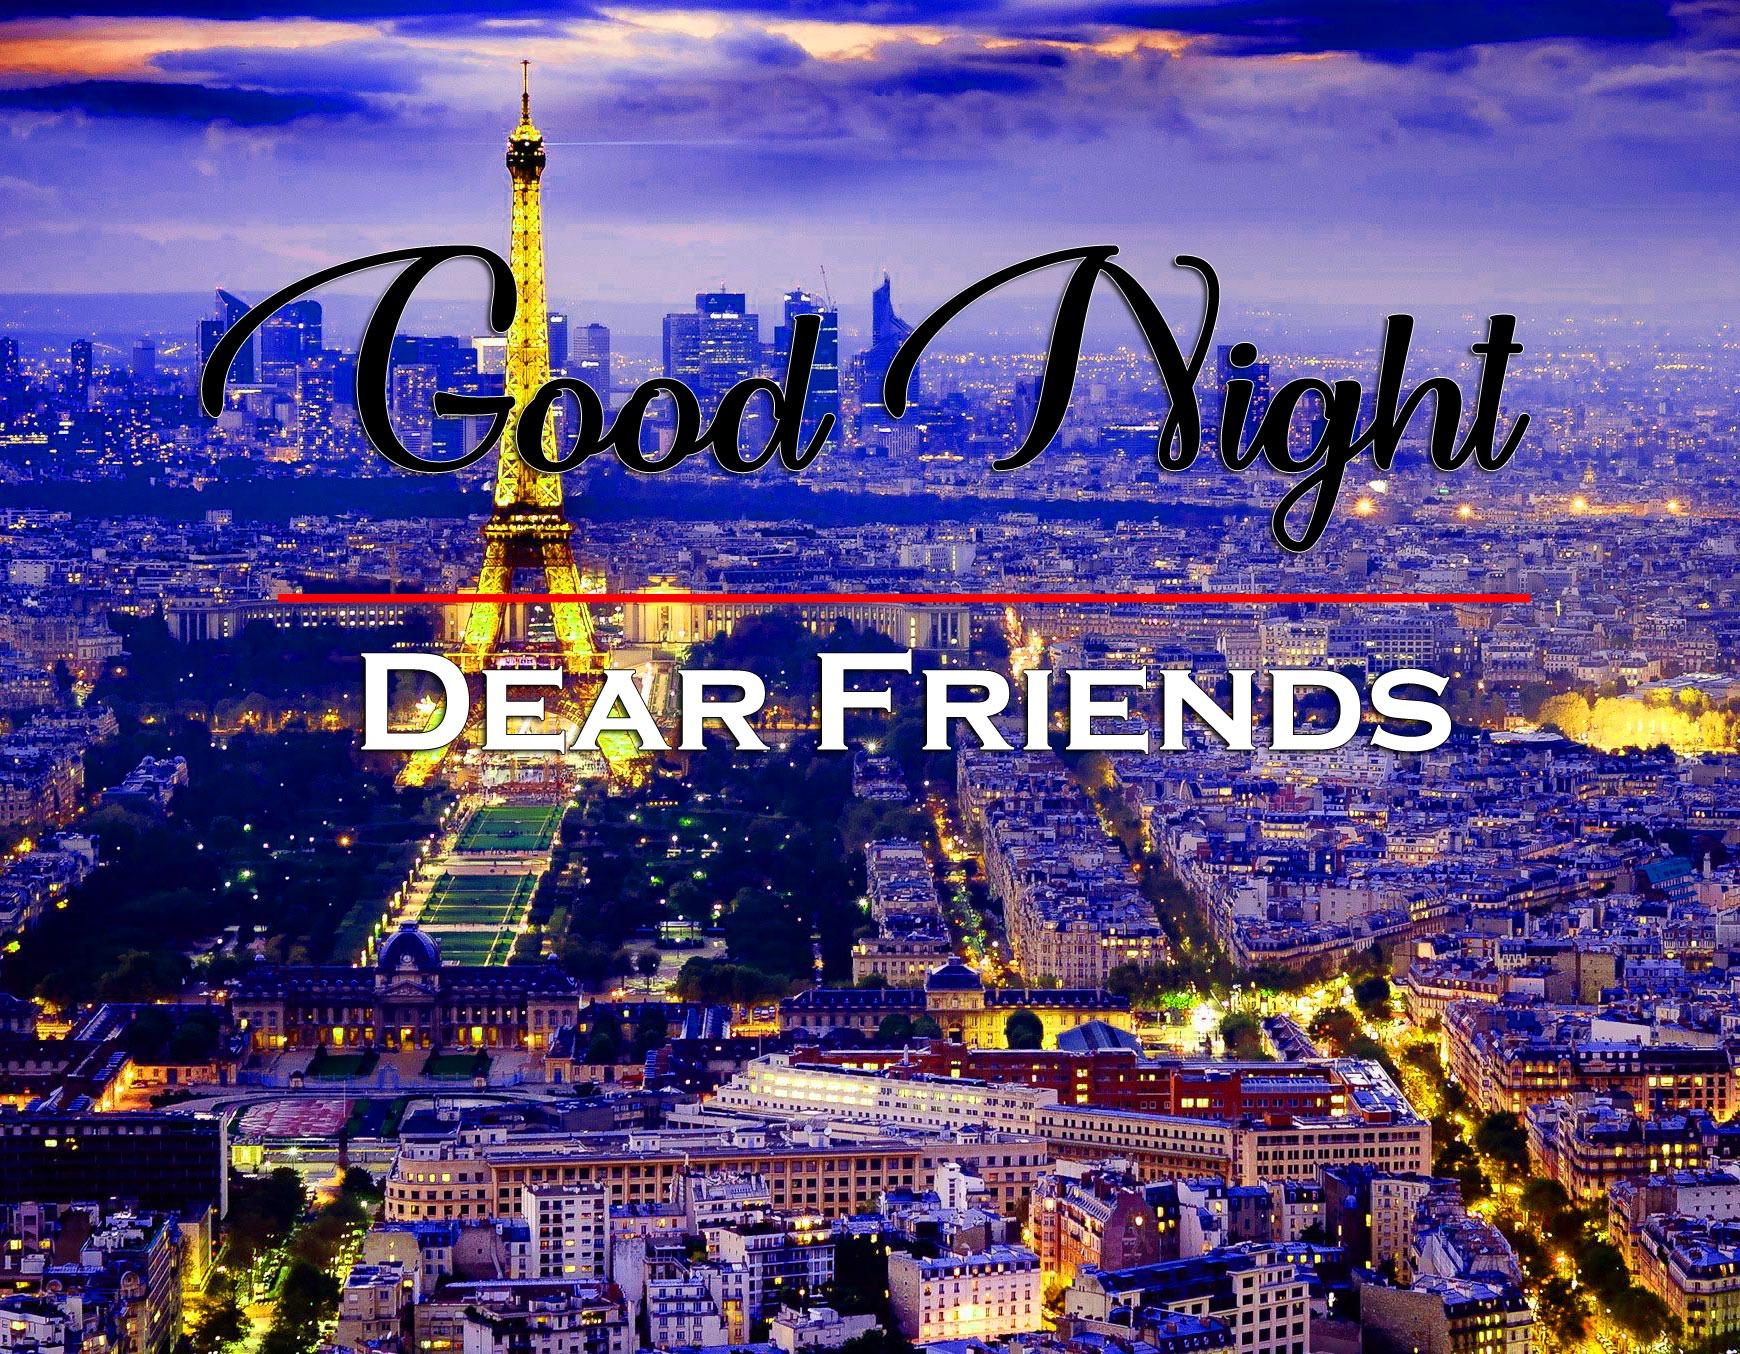 HD Good Night Pic New Download